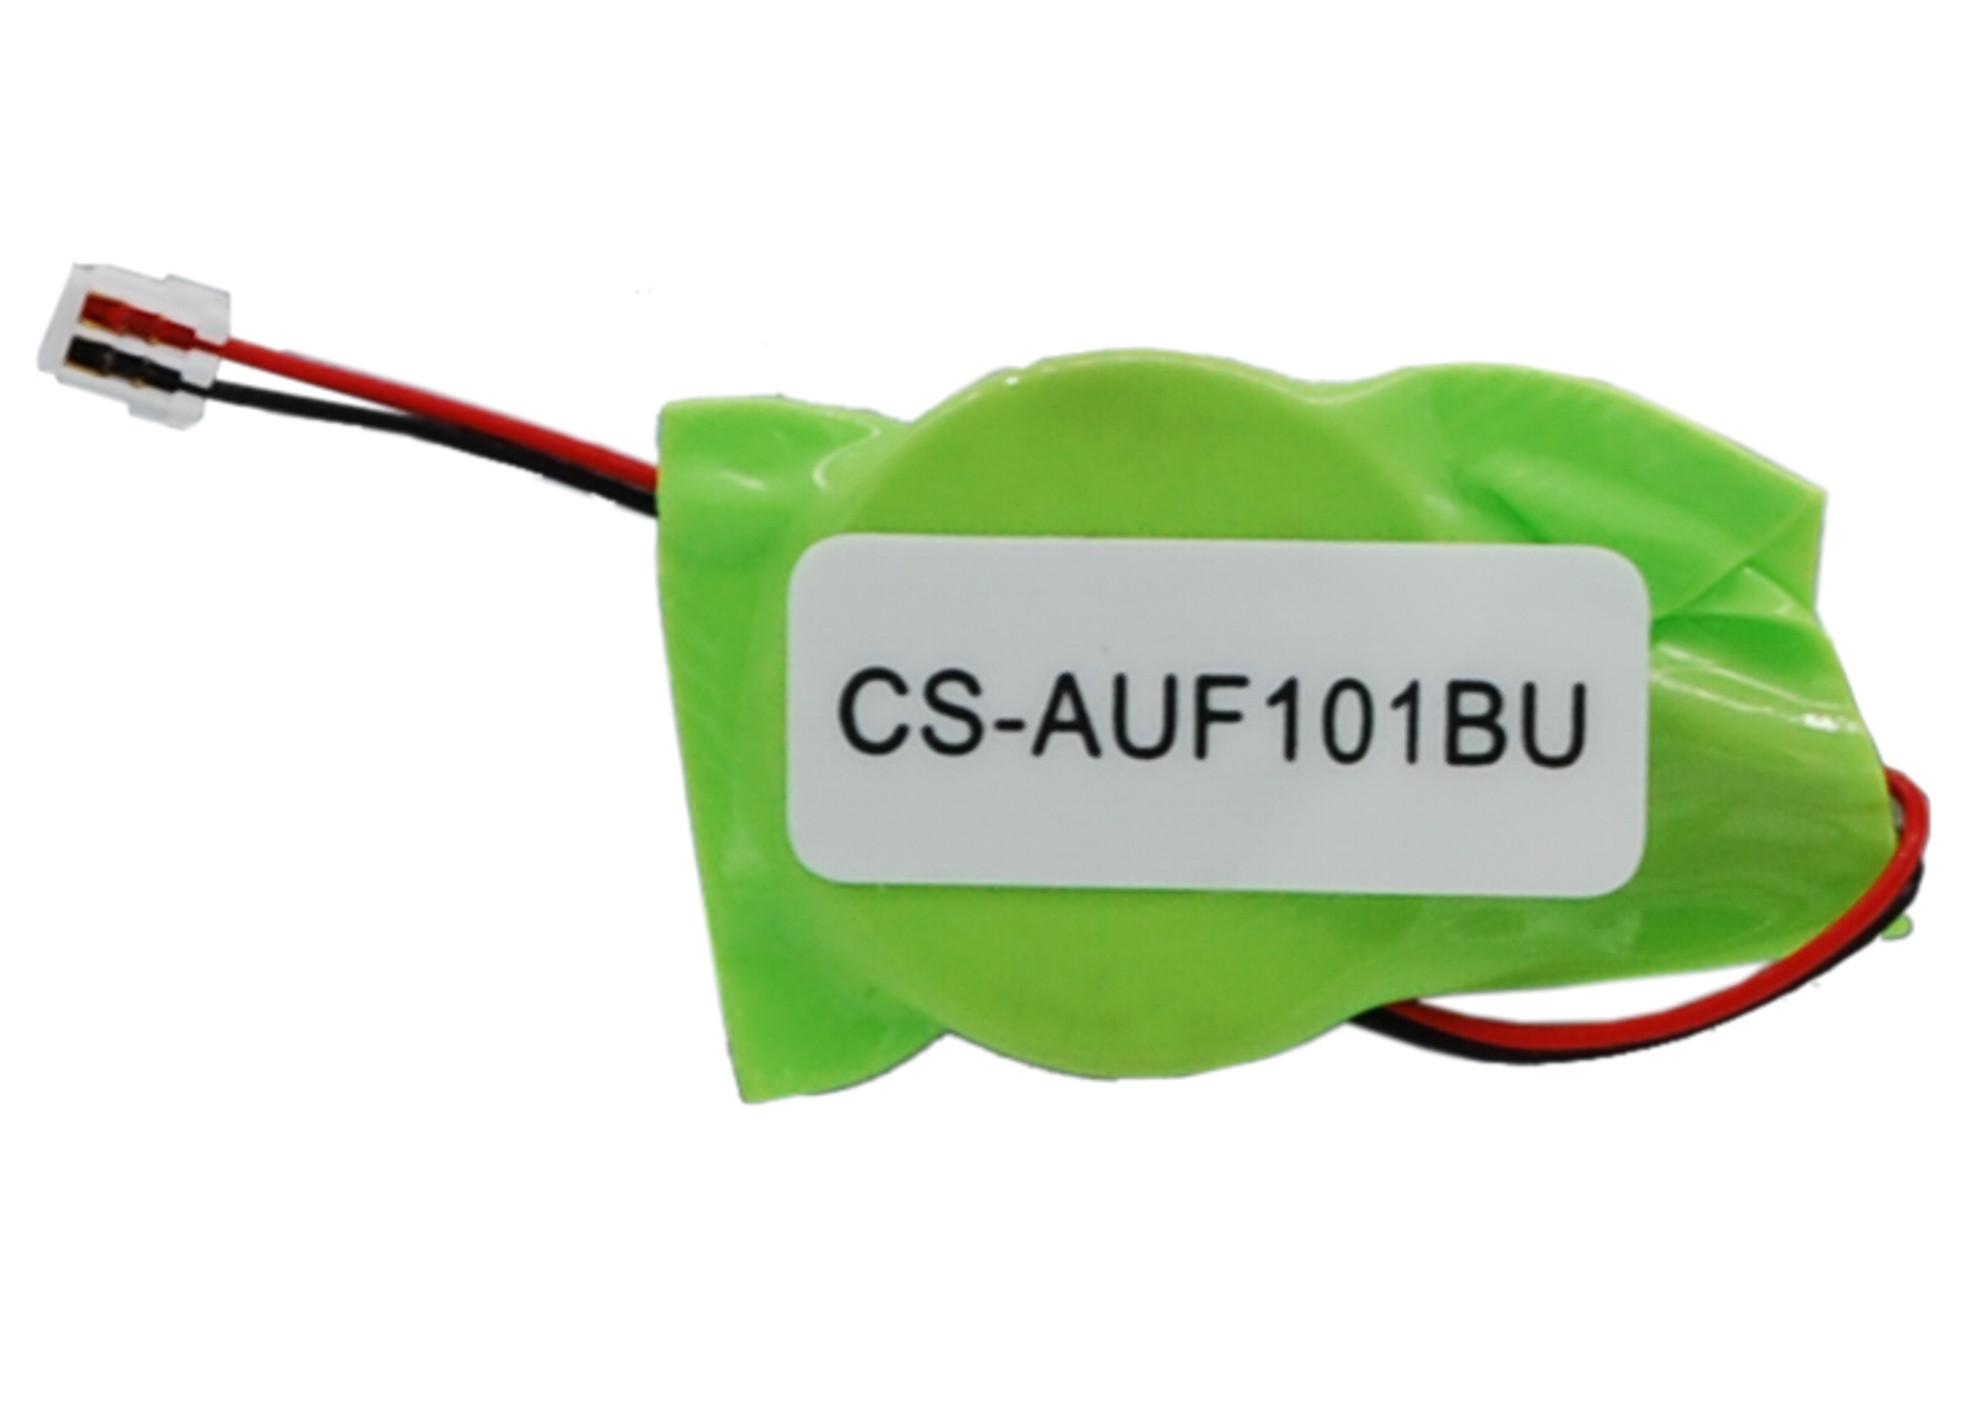 Cameron Sino baterie cmos pro ASUS Eee Pad Transformer TF101-1B118A 3V Li-ion 40mAh zelená - neoriginální